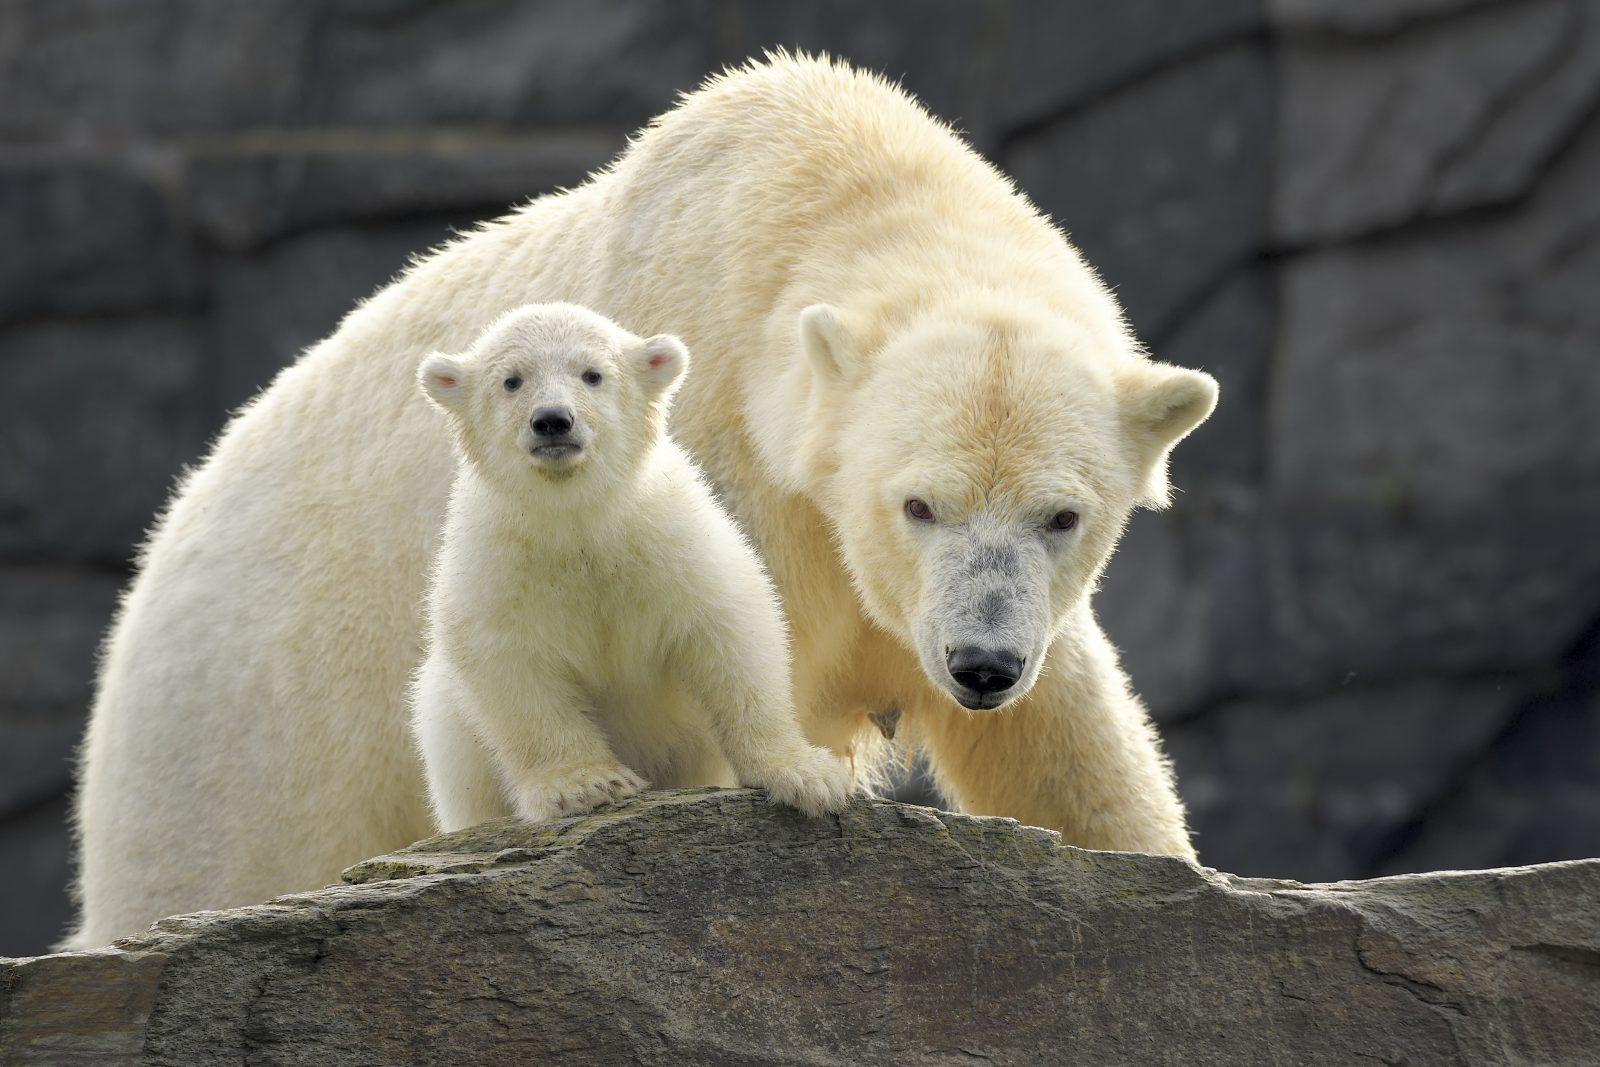 Polar bear cub Hertha with her mum Tonja standing on a rock at Eastberlin's zoo, Tierpark Berlin.